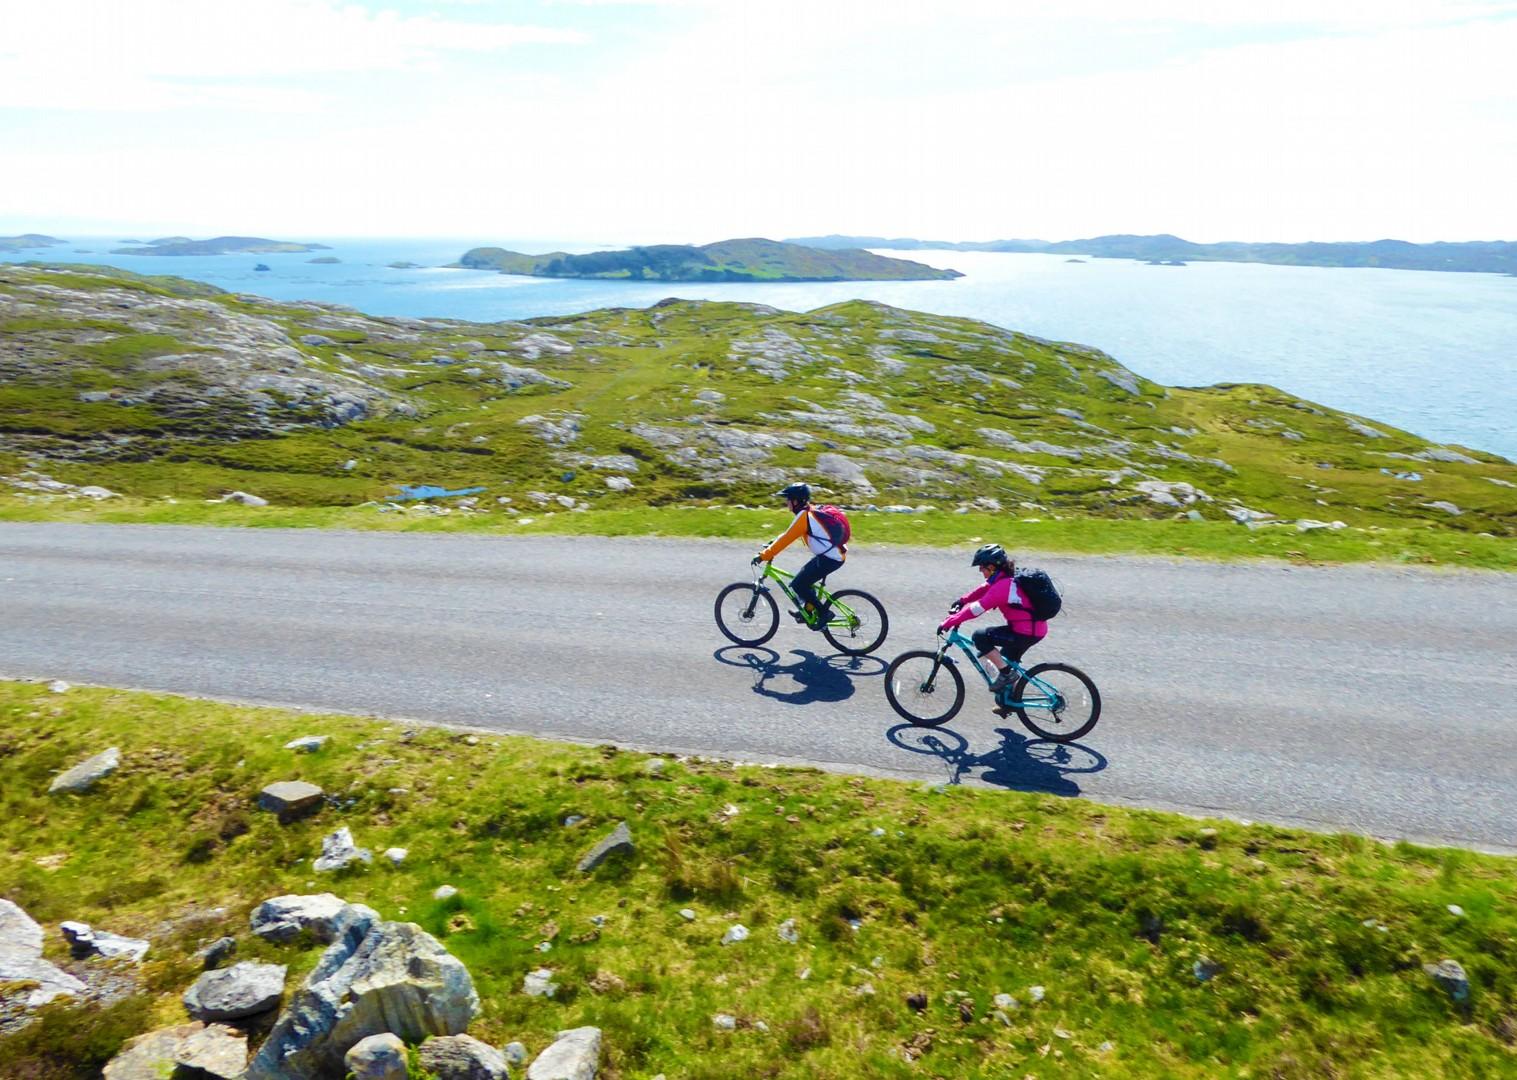 open-road-coastal-mountain-biking-cycling-holiday-in-outer-hebrides-scotland.jpg - Scotland - Hebridean Explorer - Guided Mountain Bike Holiday - Mountain Biking